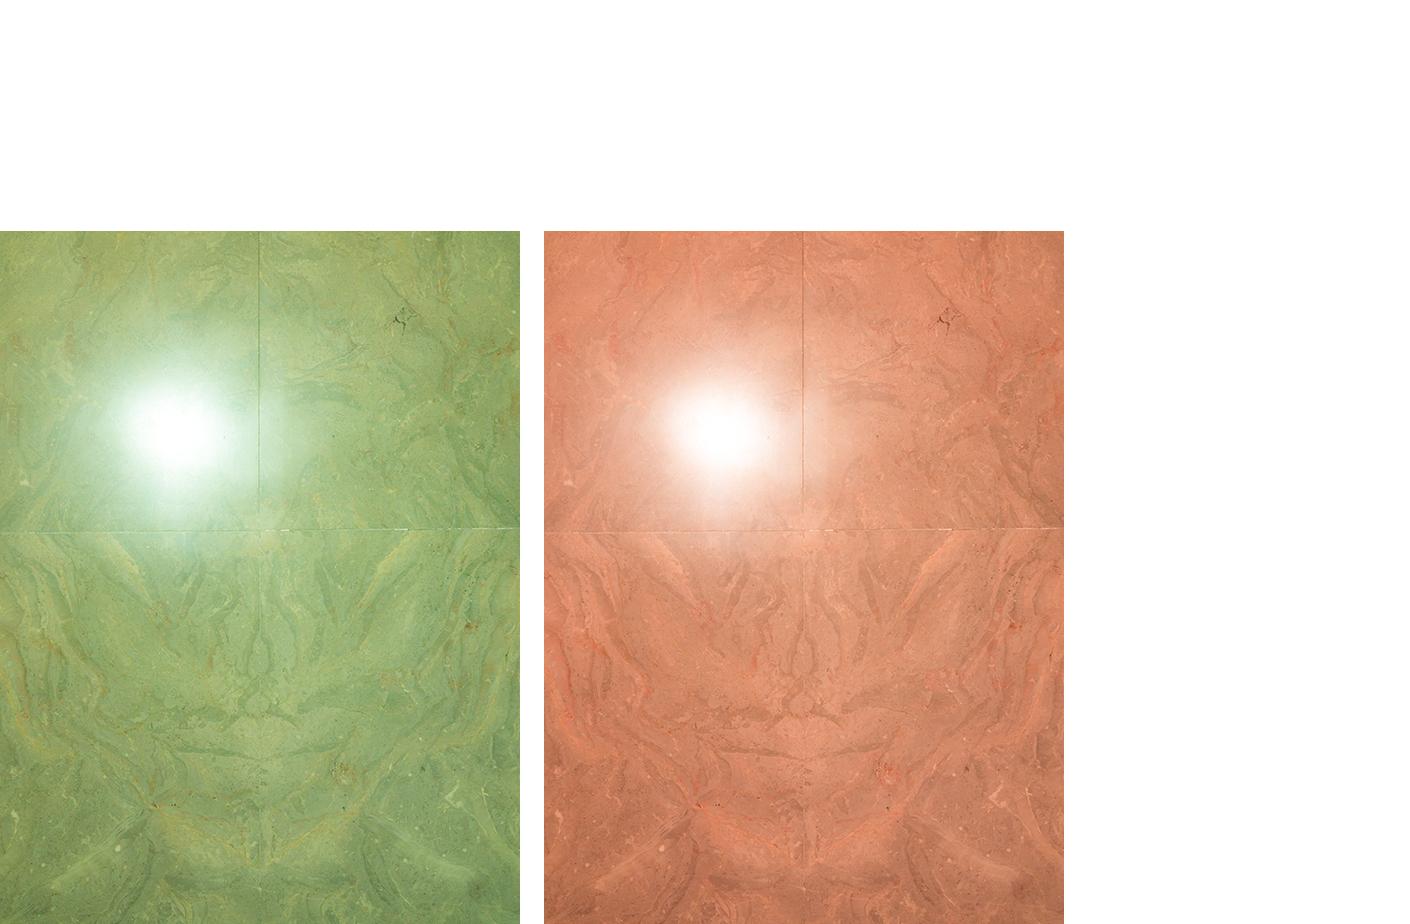 4699-26 Random Pairings #26 4699-27 Random Pairings #27  Pigment Print 5.25 x 7.00 inch Image Size 8.50 x 11.00 inch Paper Size 2 EDP / 4AP